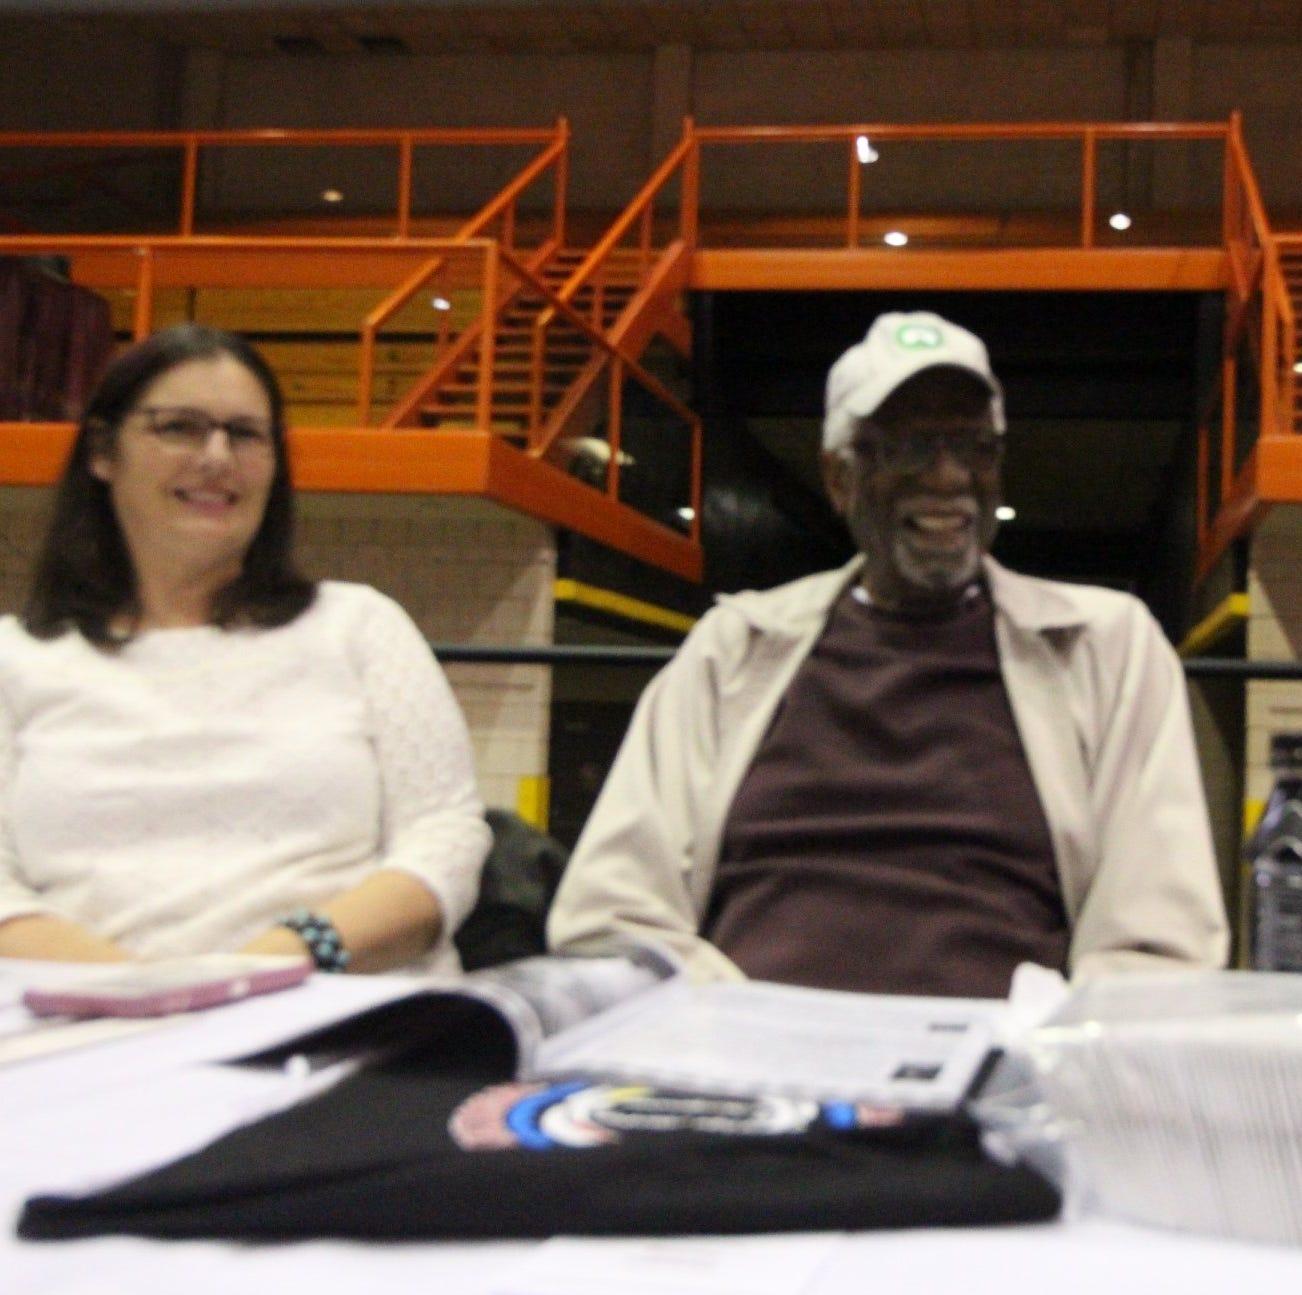 NBA legend Bill Russell visits Rapid City for Lakota Nation Invitational on Thursday